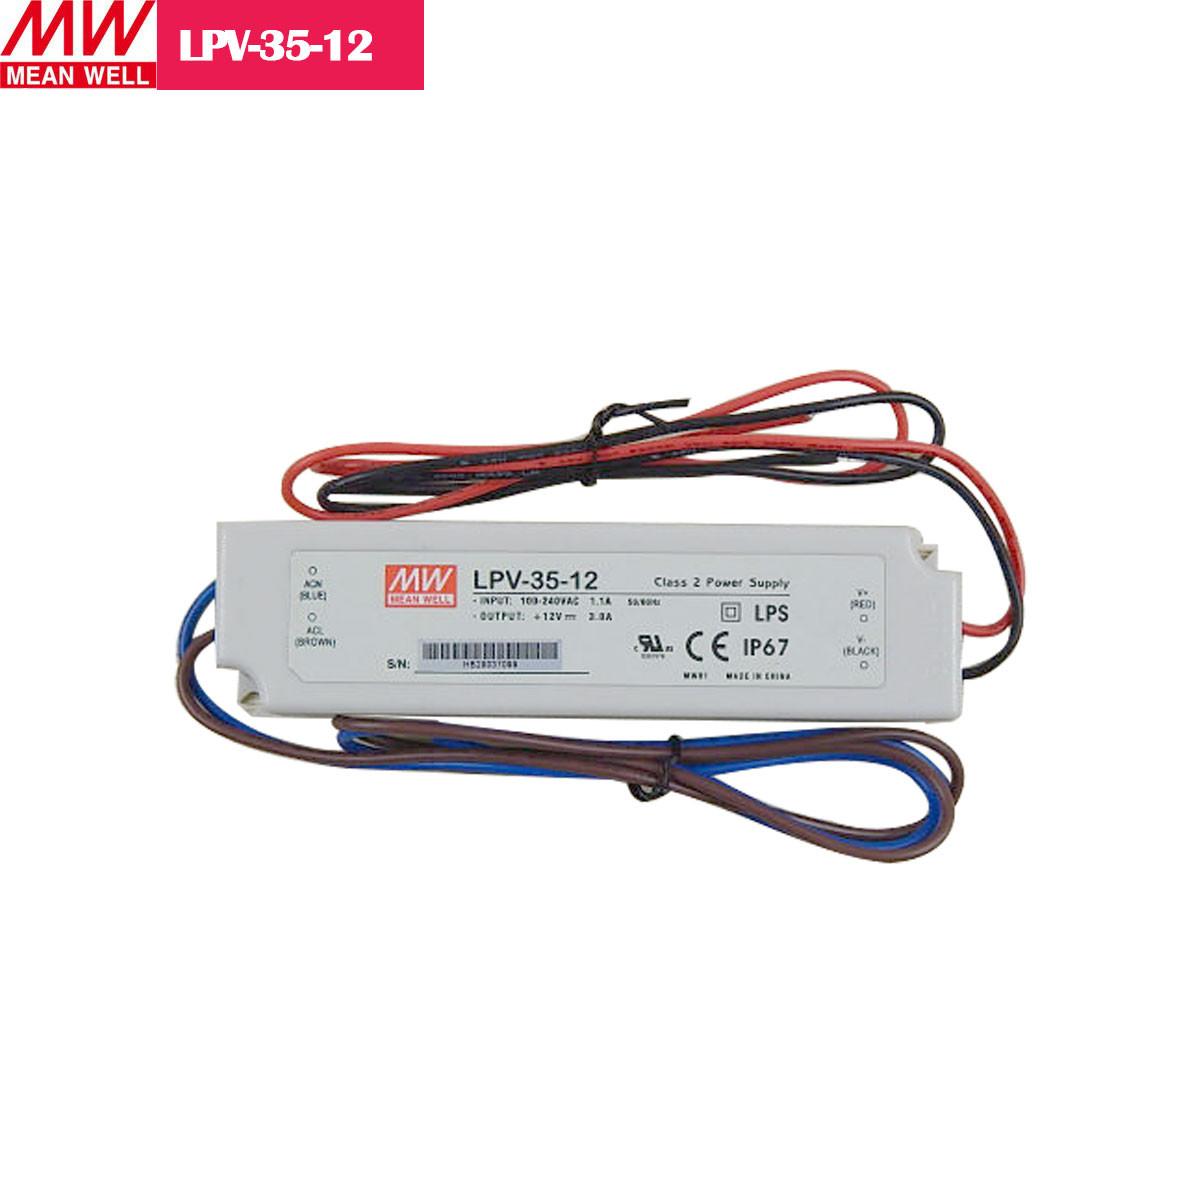 12V 2.92Amp 35W MEANWELL UL Certificated LPV series IP67 Waterproof Power Supply